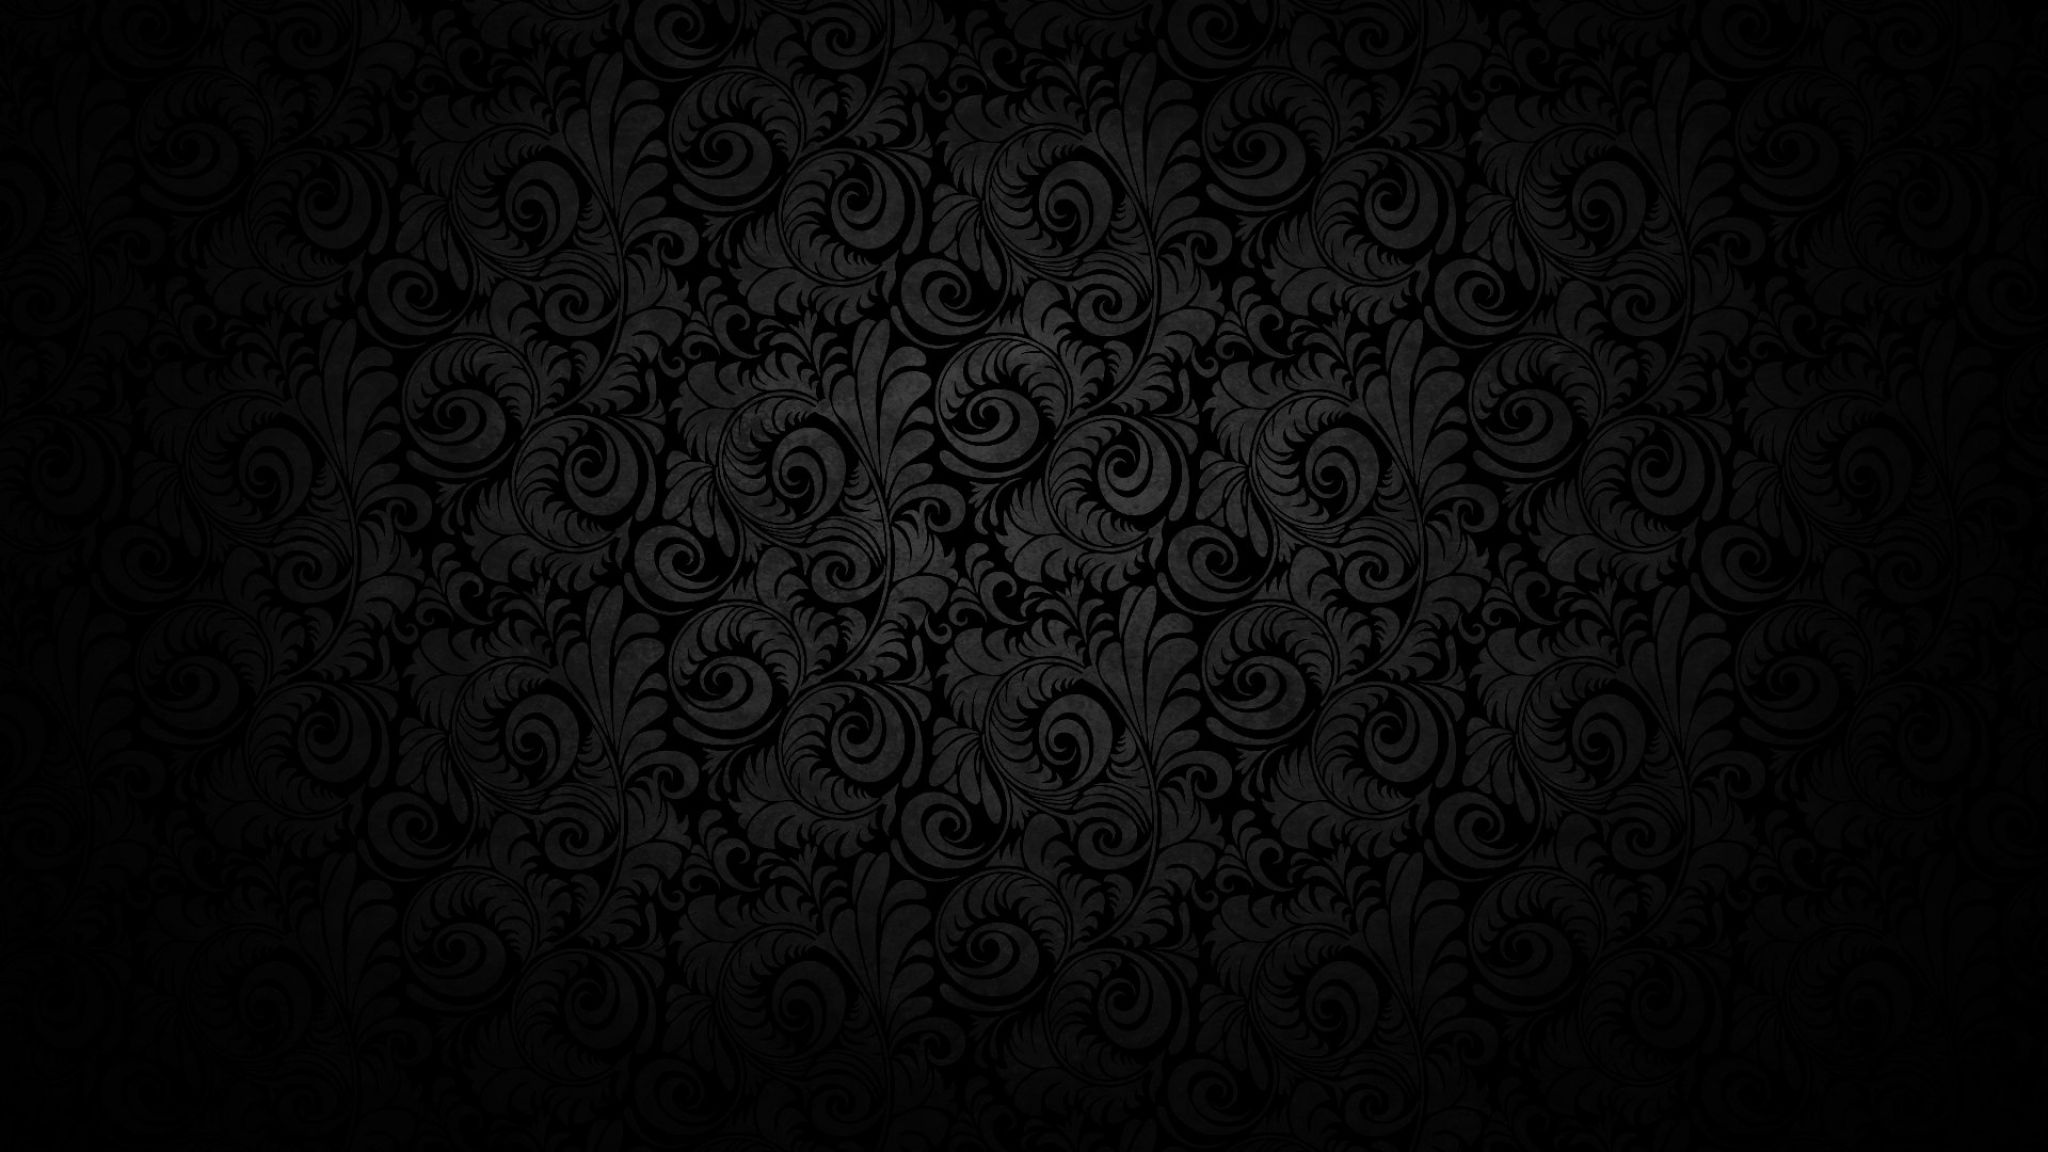 2048x1152 Black Wallpapers Top Free 2048x1152 Black